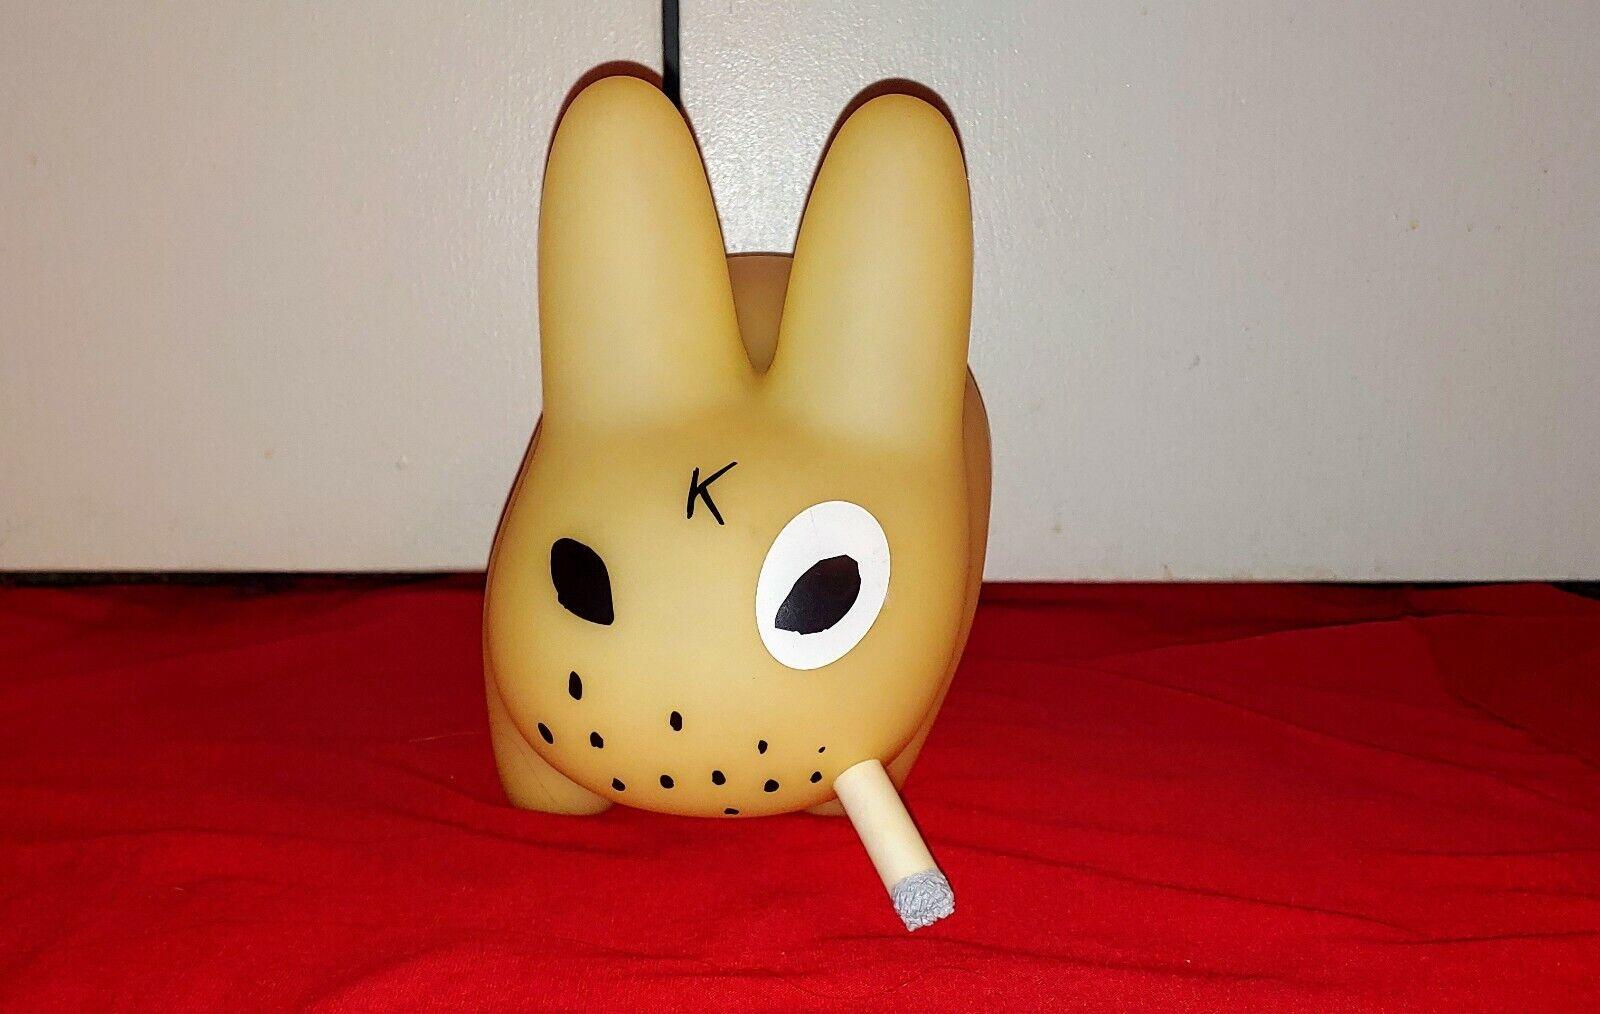 RARE   Kidrobot Kidrobot Kidrobot 10  GLOW IN THE DARK Smorkin Labbit Vinyl Figure Toy Frank Kozik 98a067